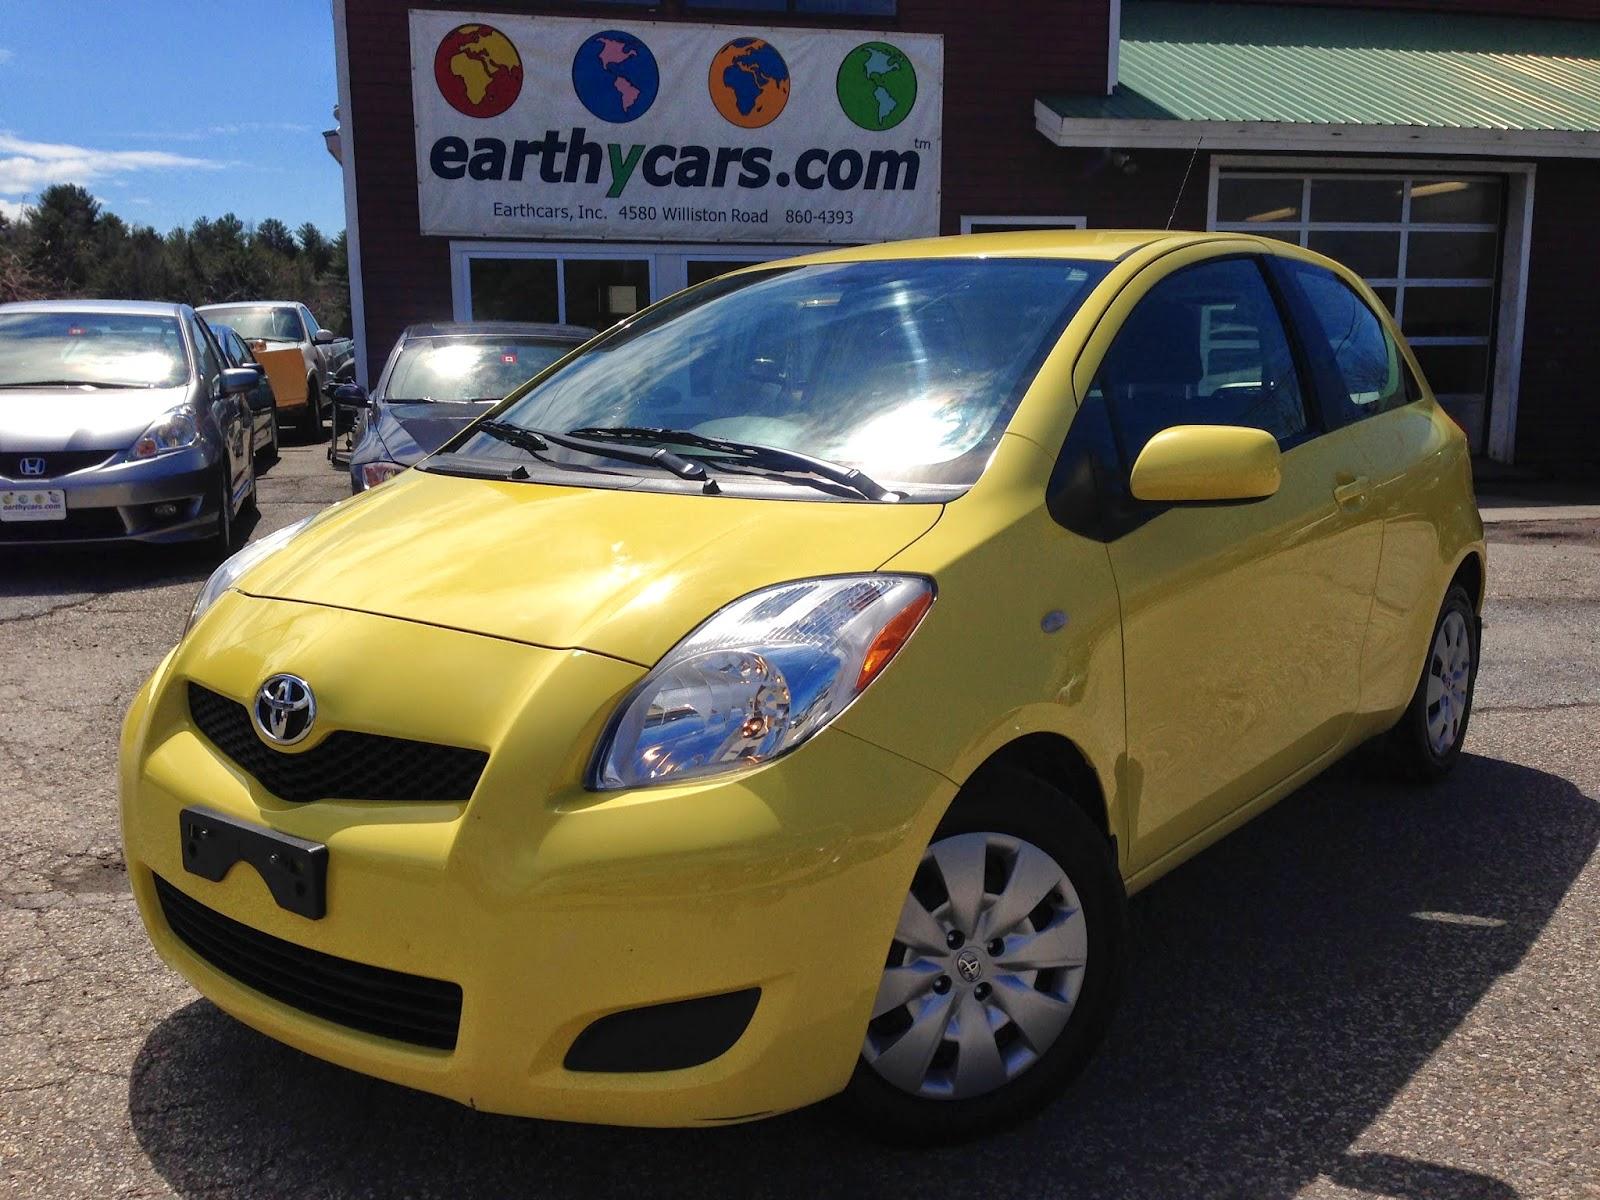 2009 Toyota Yaris 3 Door Liftback, Yellow, 81267 Mi, $8,995  Http://bit.ly/1oottPJ Subcompact, 5 Spd Manual, MPG U003d 29/36